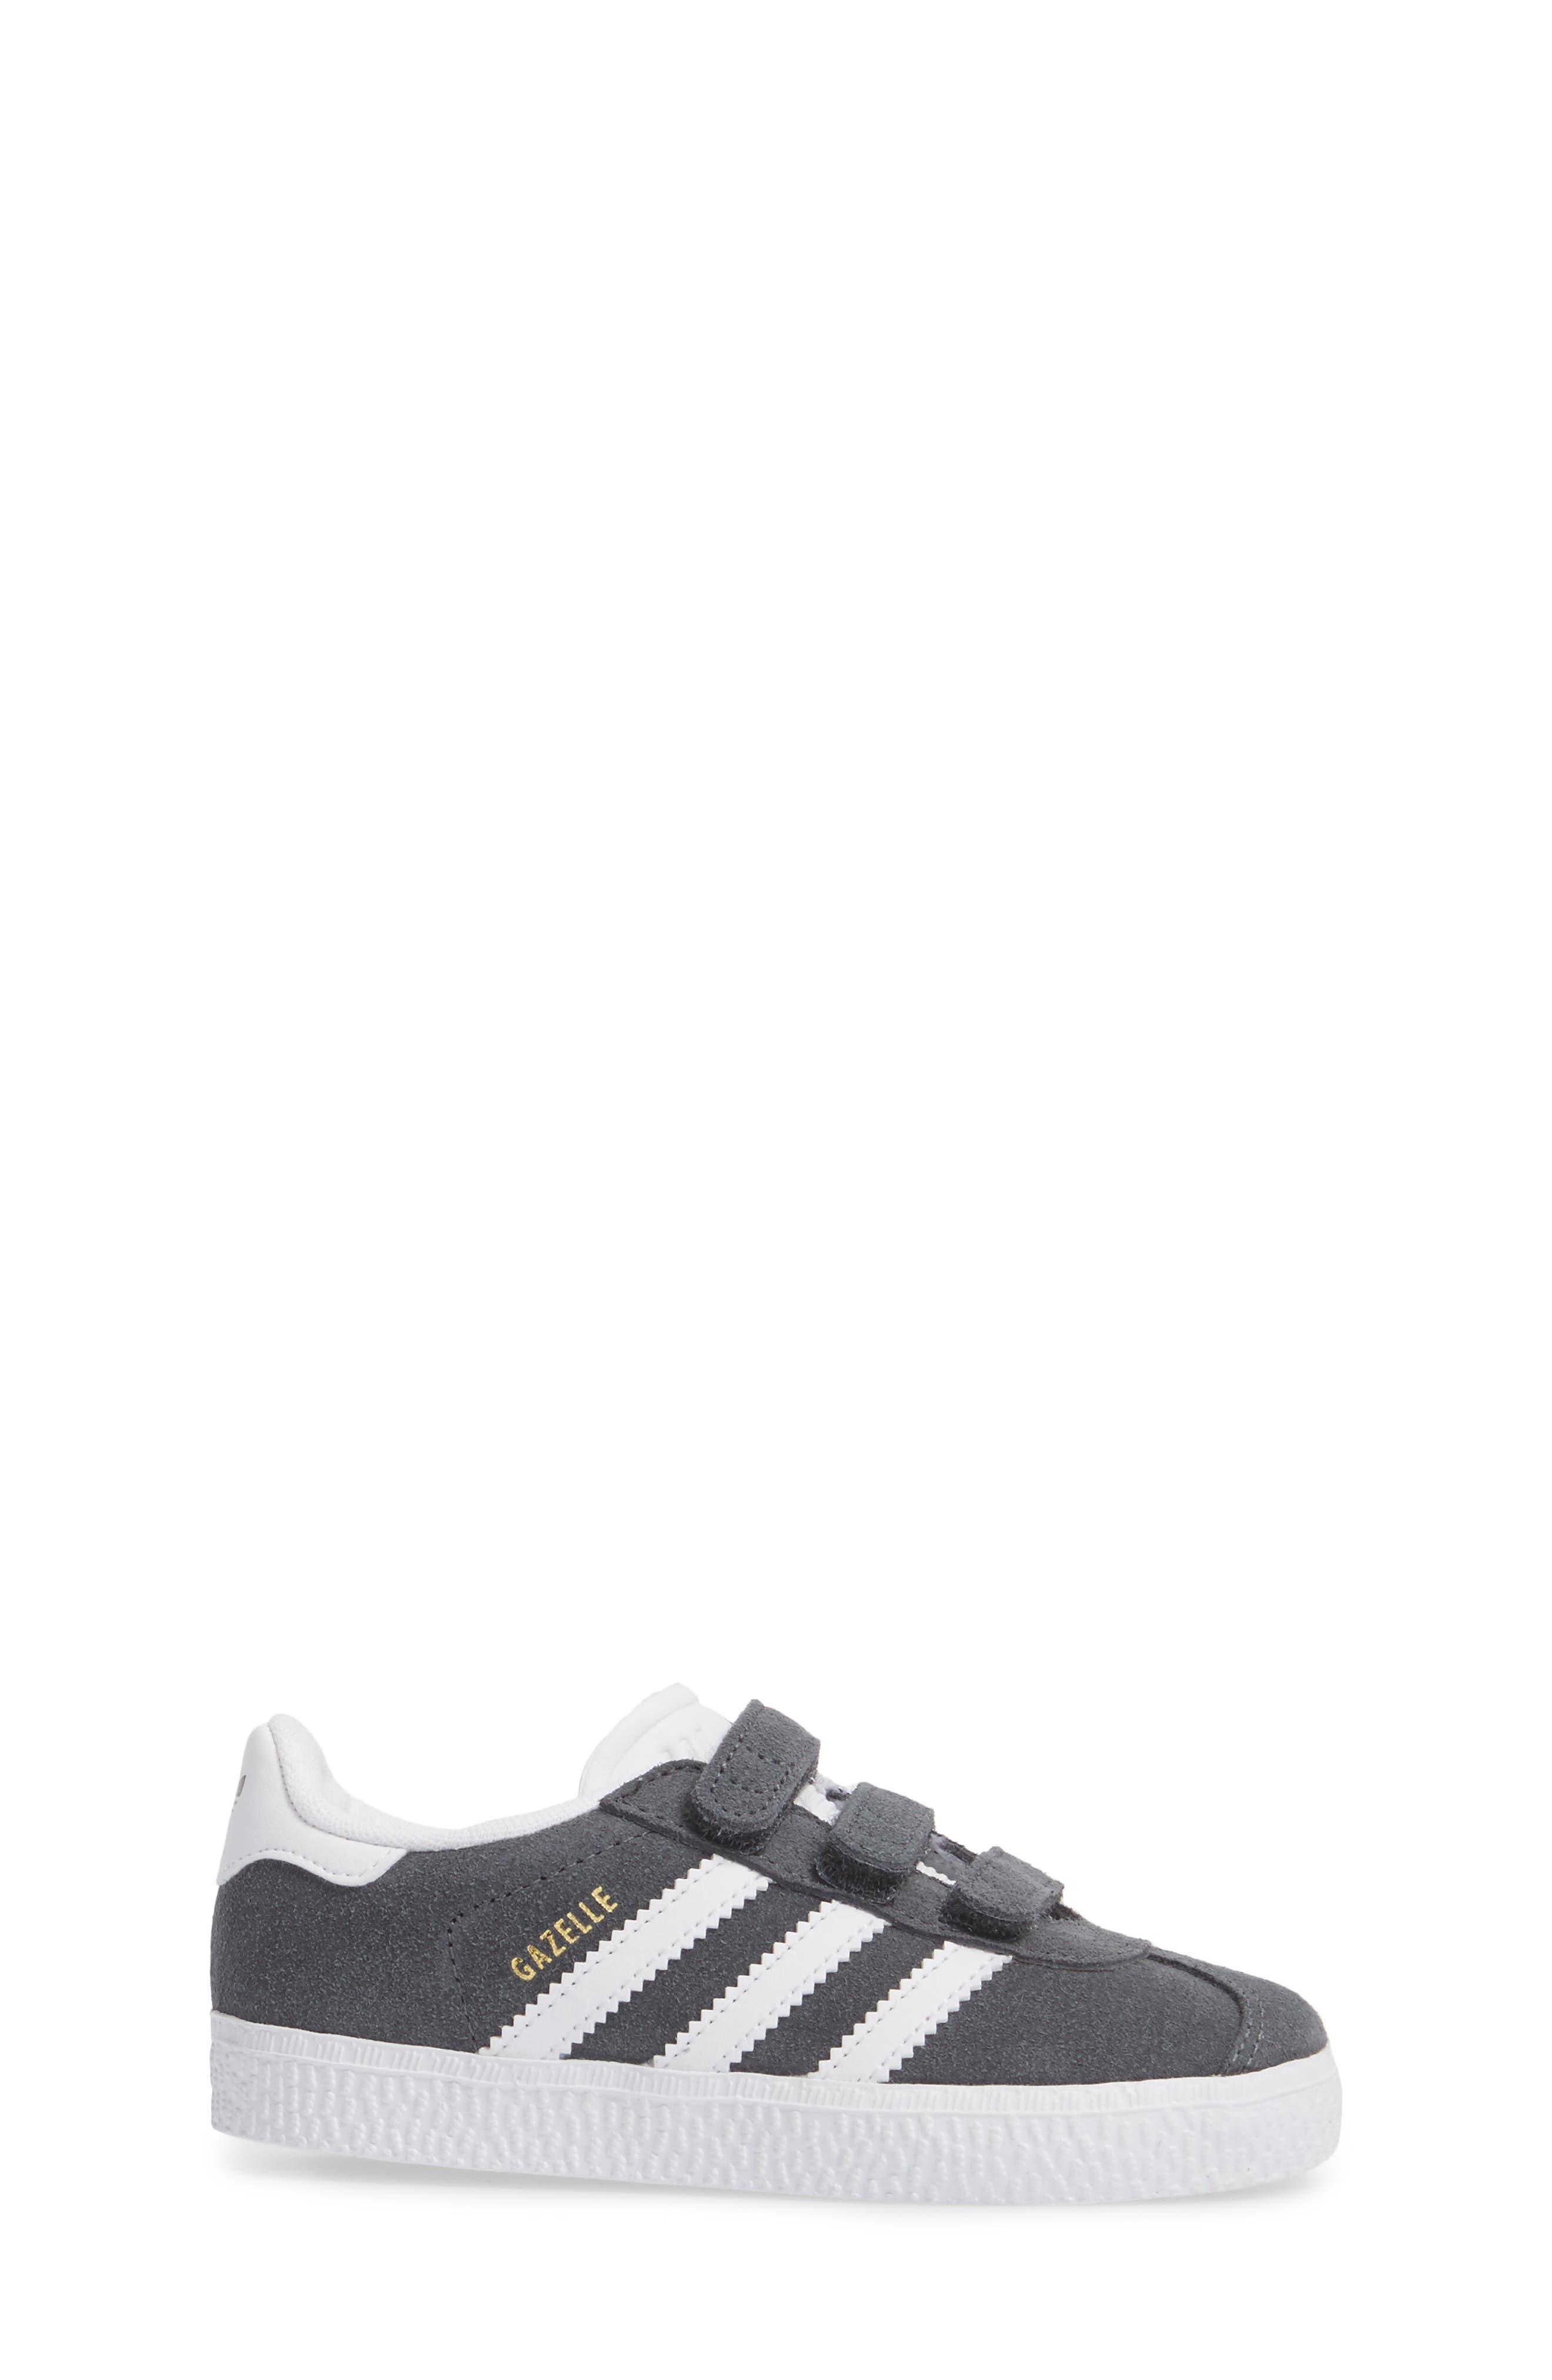 Gazelle Sneaker,                             Alternate thumbnail 3, color,                             SOLID GREY / WHITE / WHITE